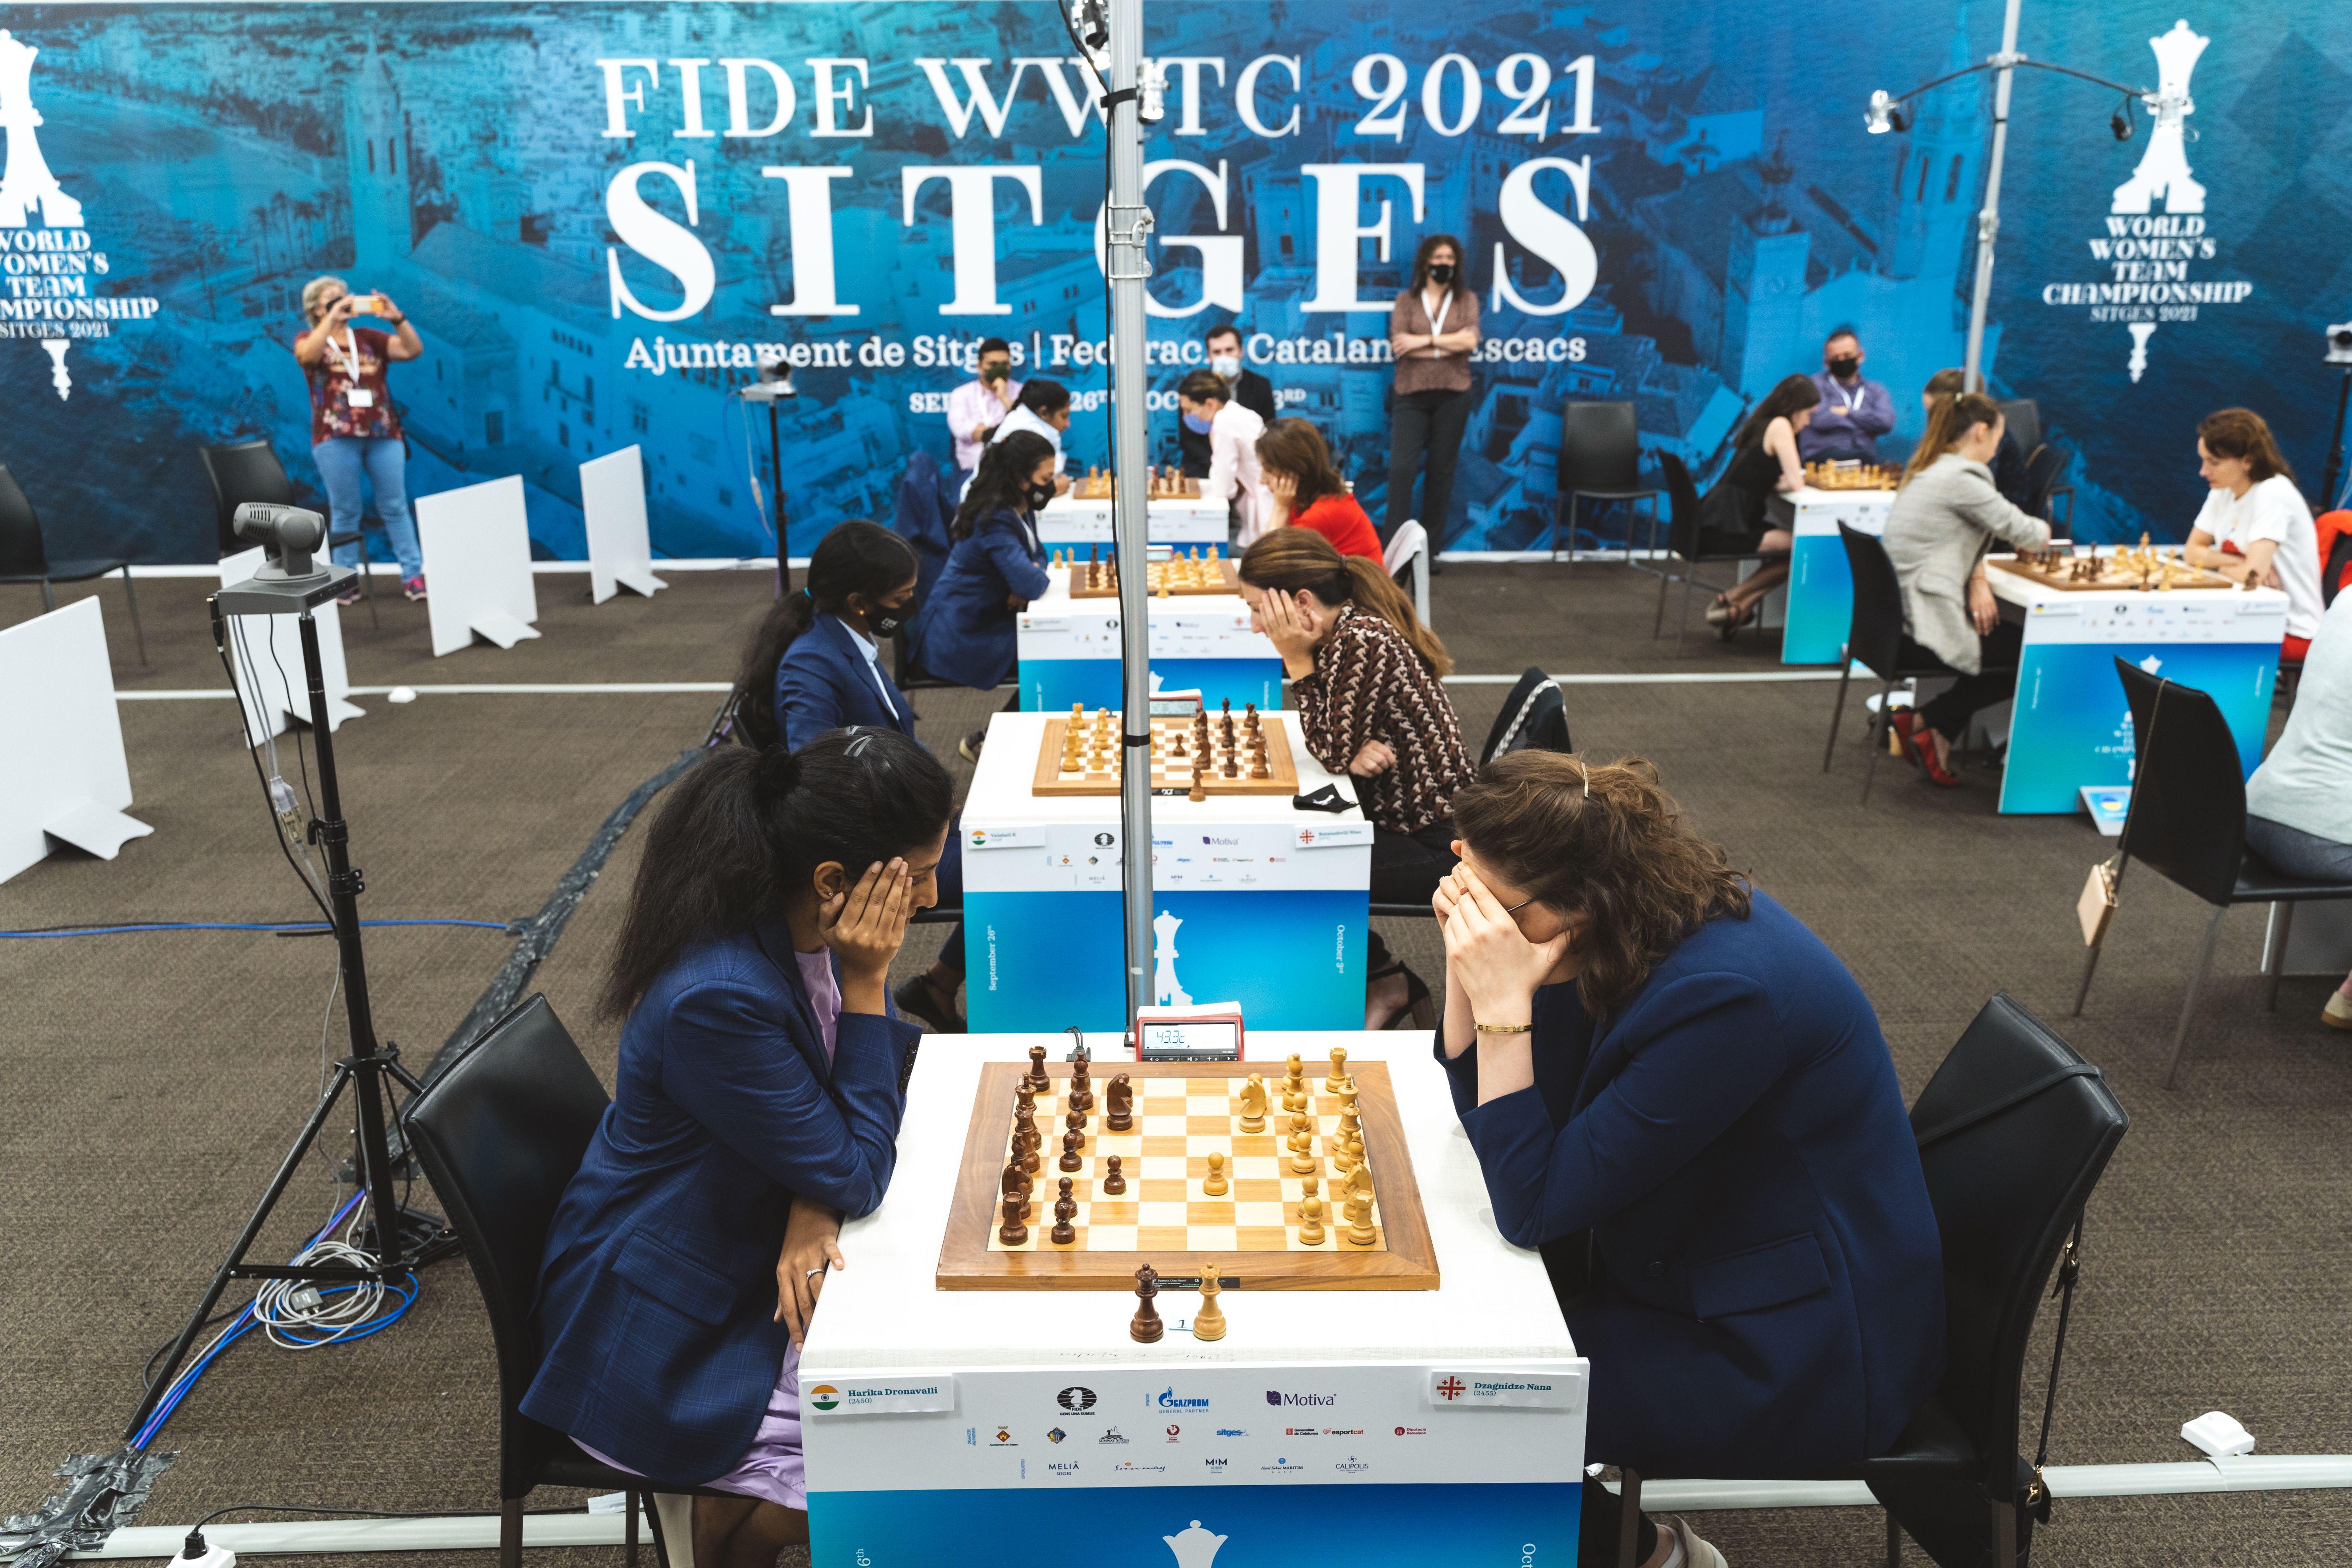 Georgia vs India semi-final match at the Women's World Team Championship